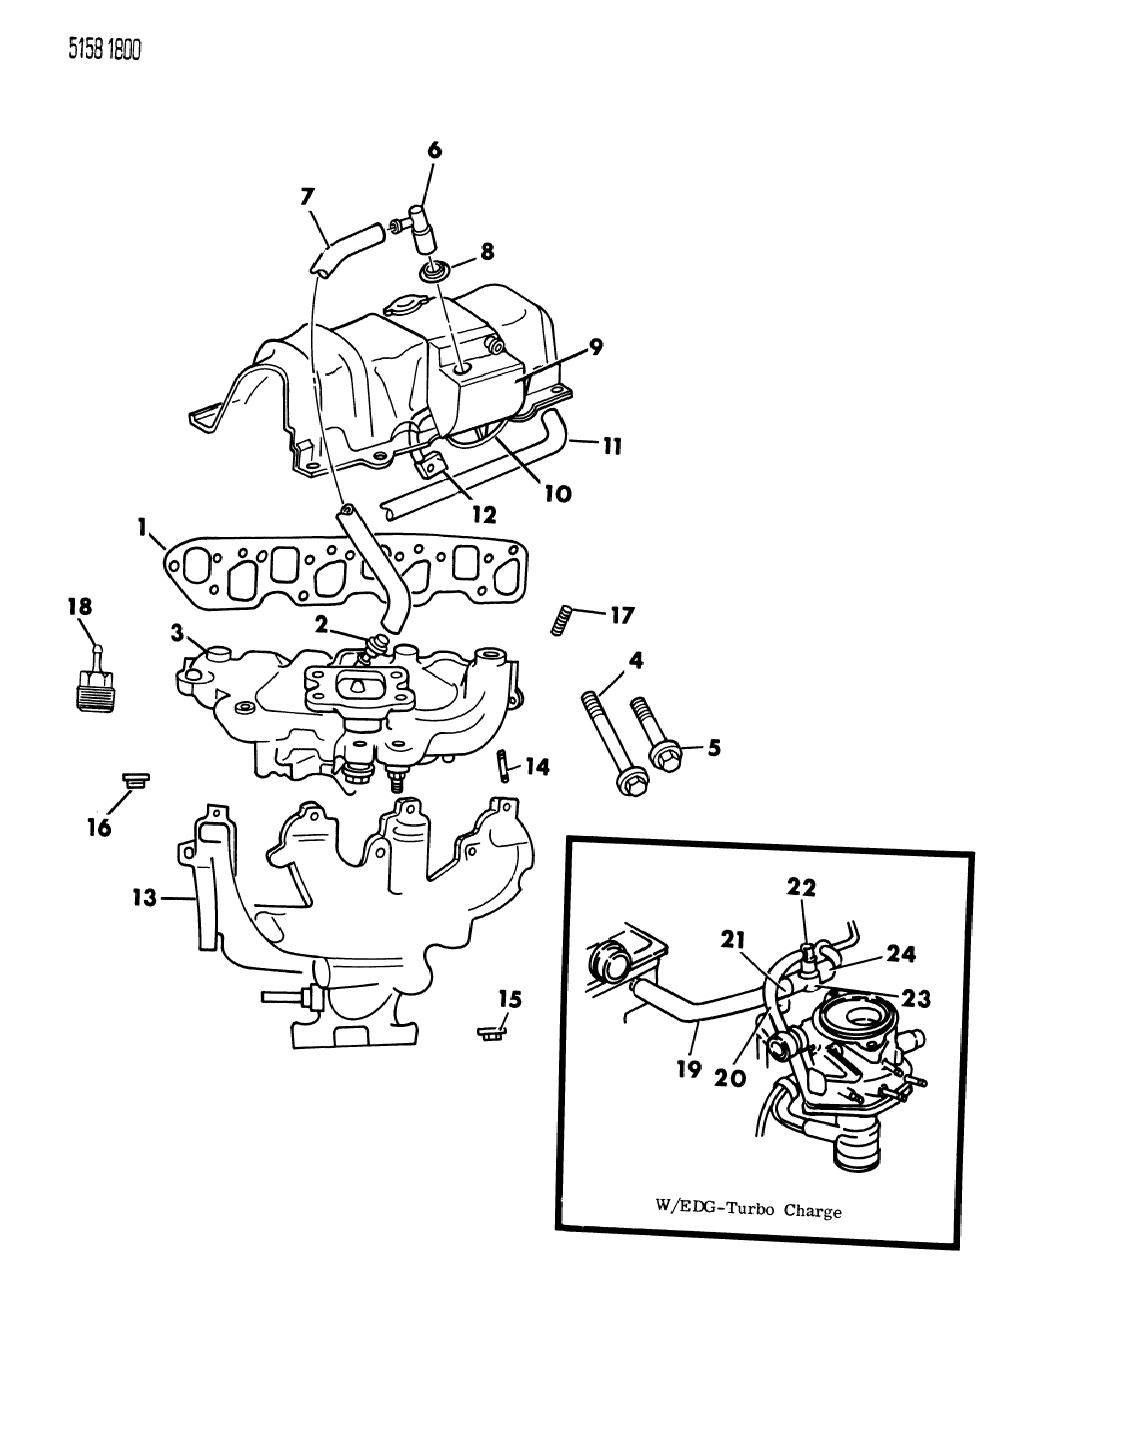 [SCHEMATICS_4PO]  1985 Chrysler LeBaron GTS Manifold - Intake, Exhaust, Crankcase Vent System | 1985 Chrysler 2 2l Engine Diagram |  | Mopar Parts Giant